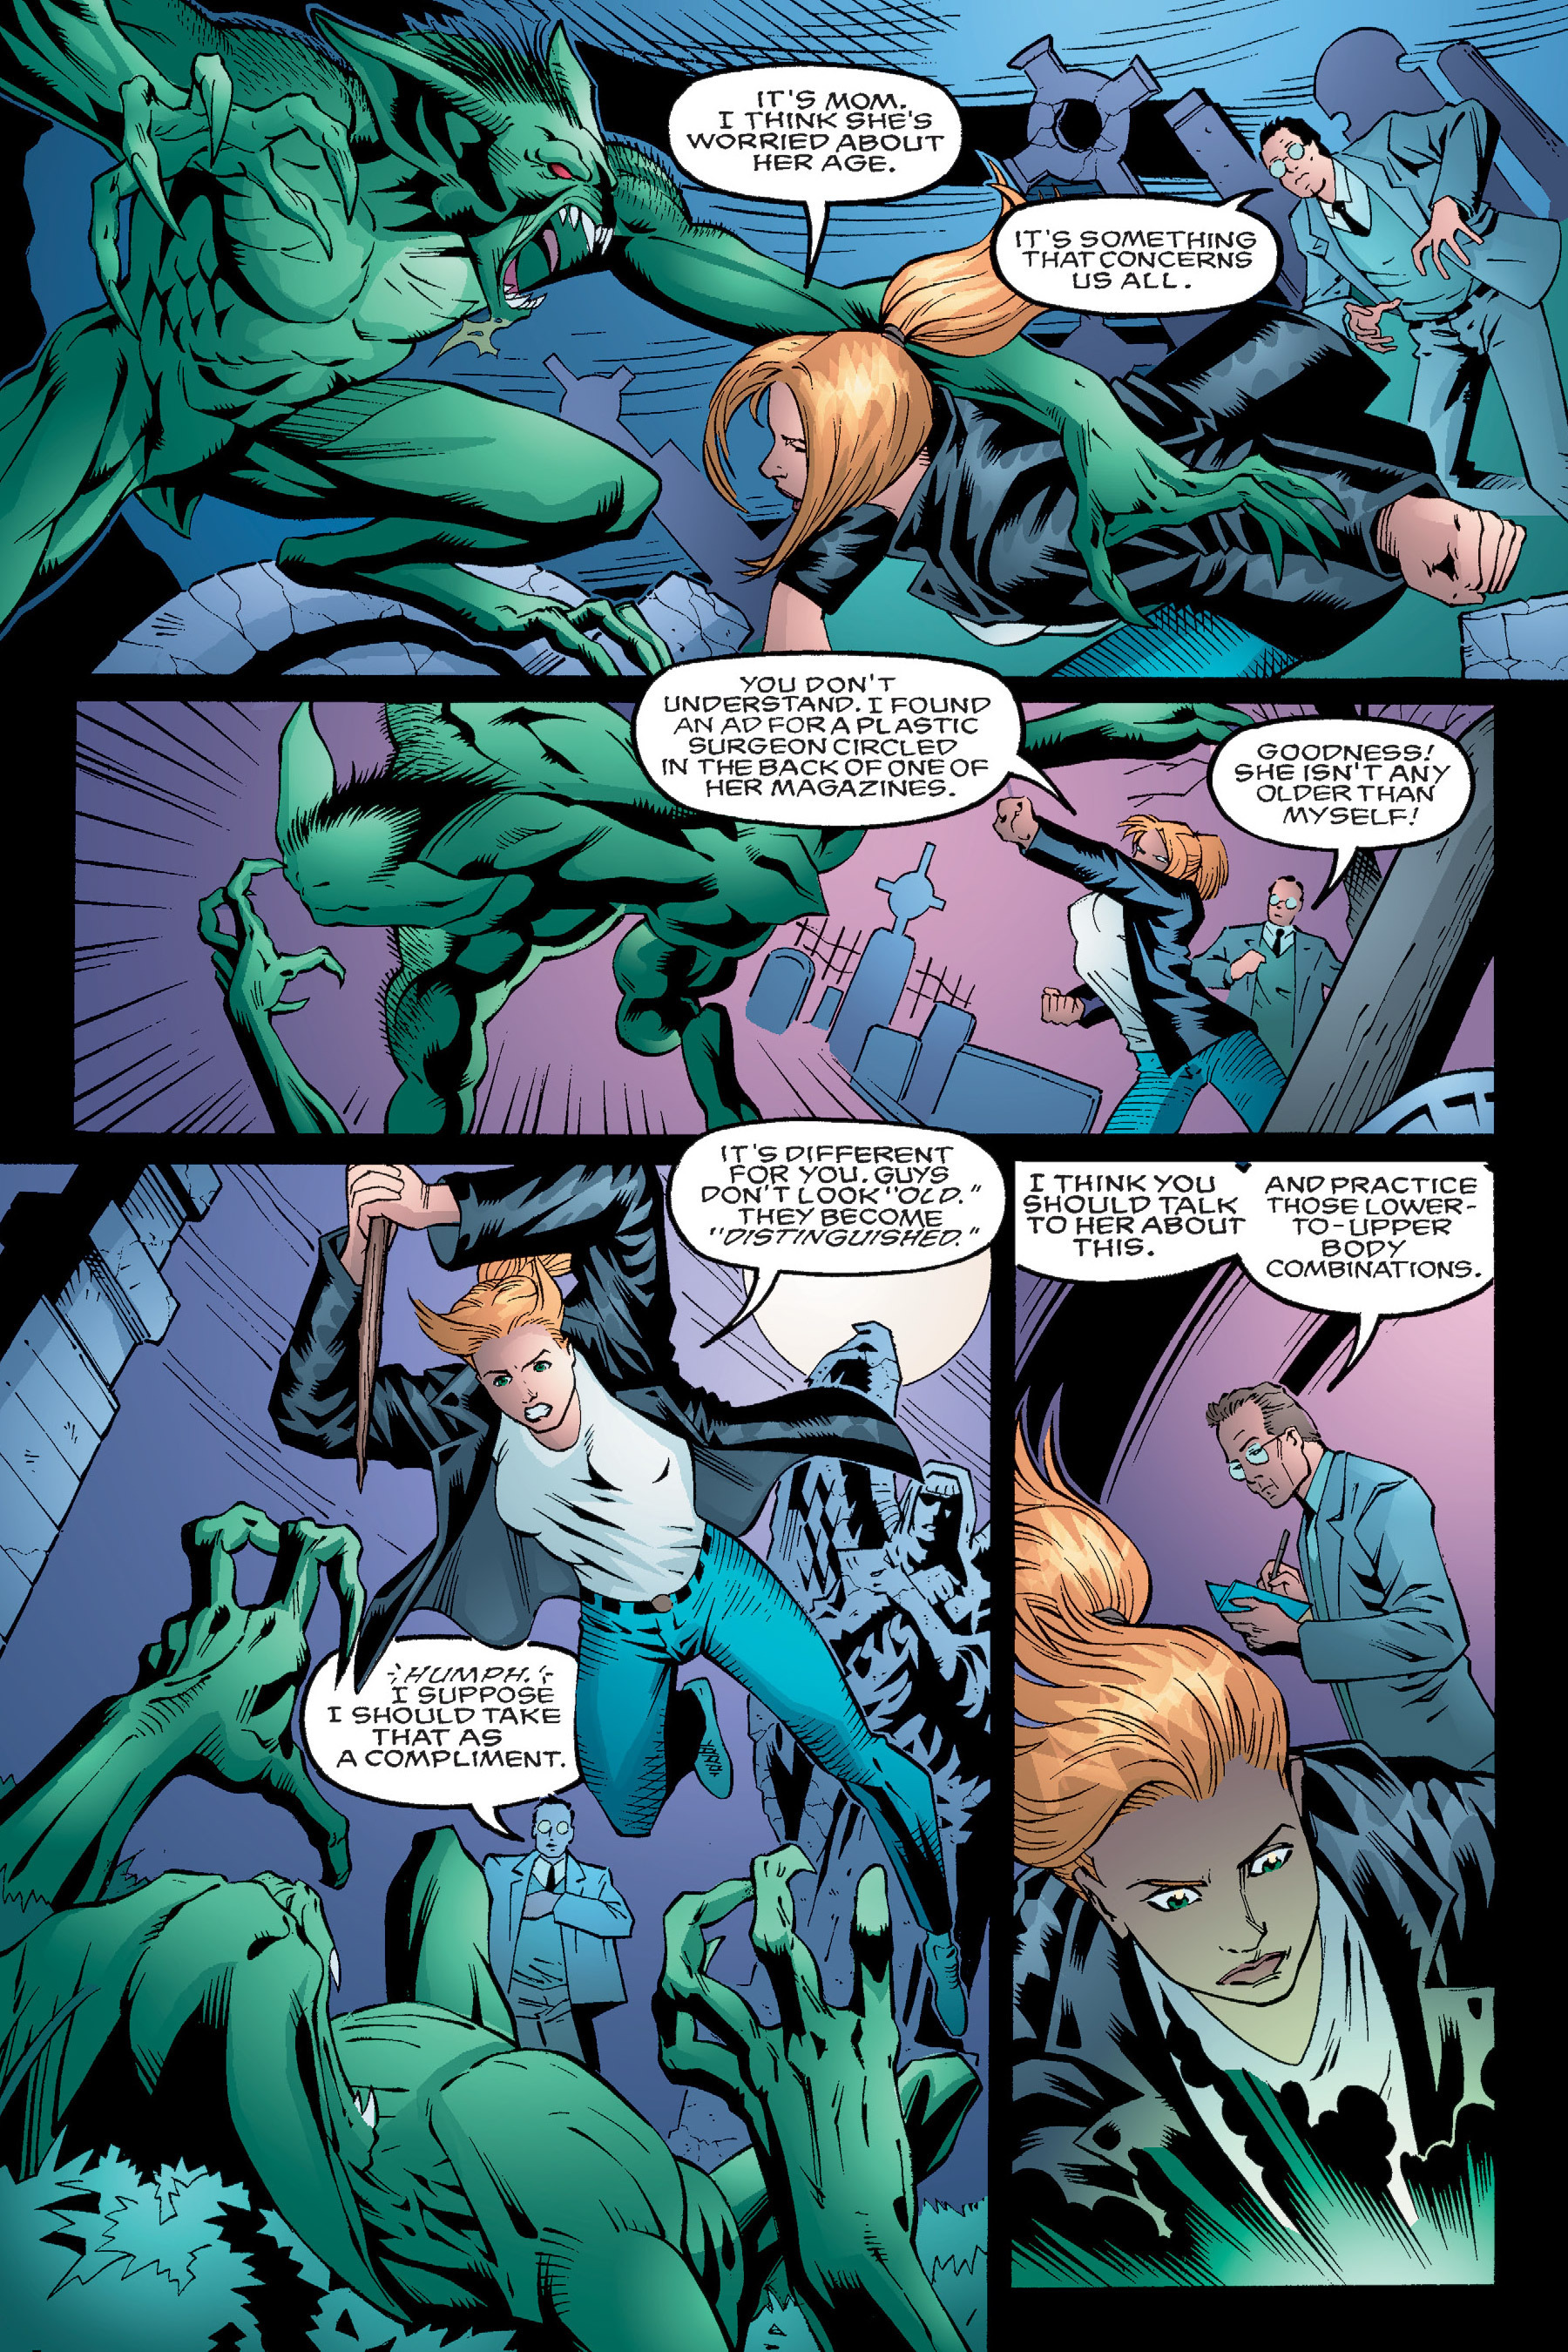 Read online Buffy the Vampire Slayer: Omnibus comic -  Issue # TPB 4 - 25